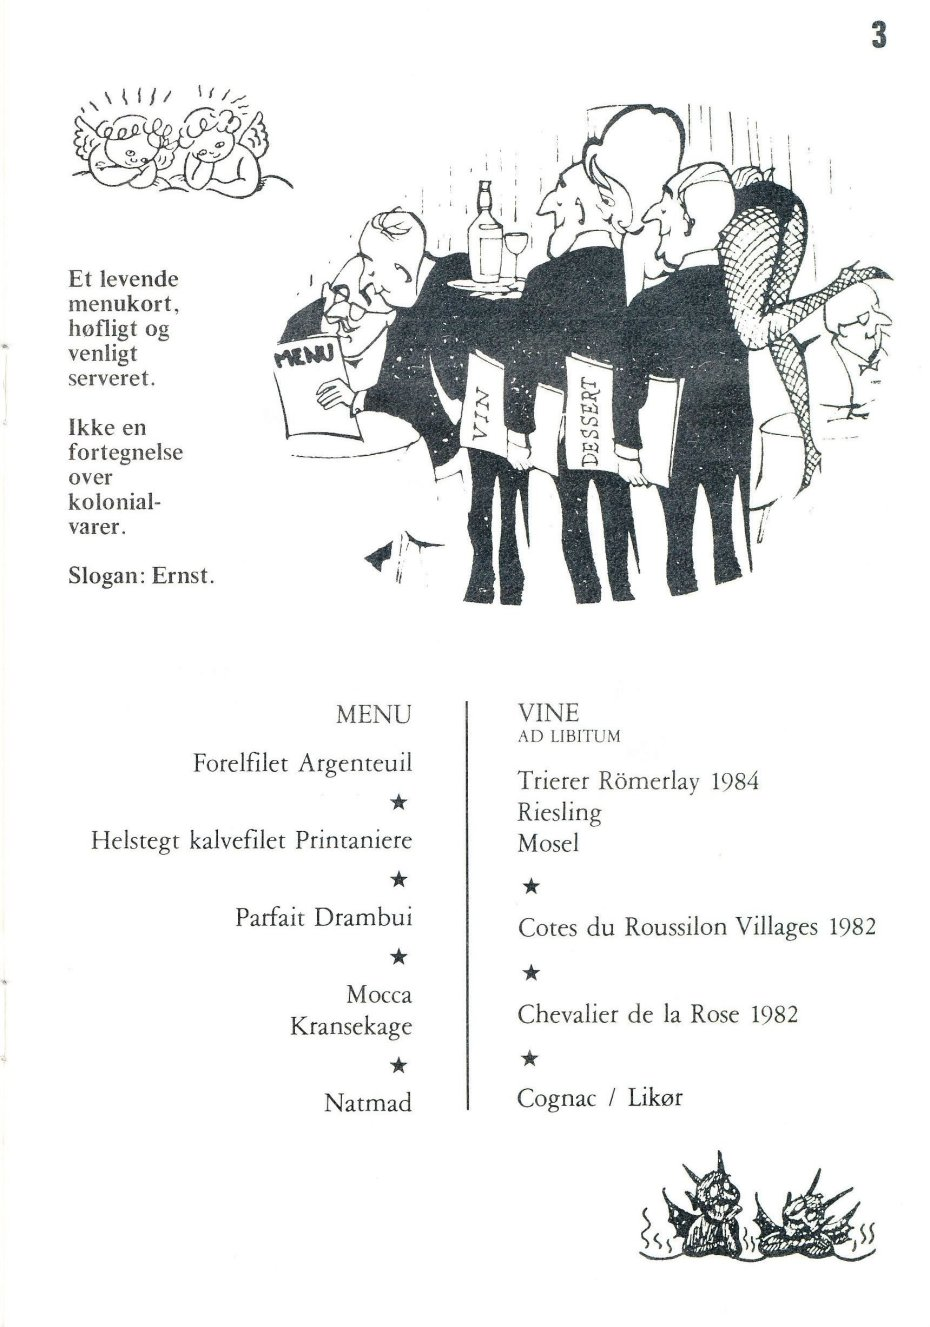 75 år menu